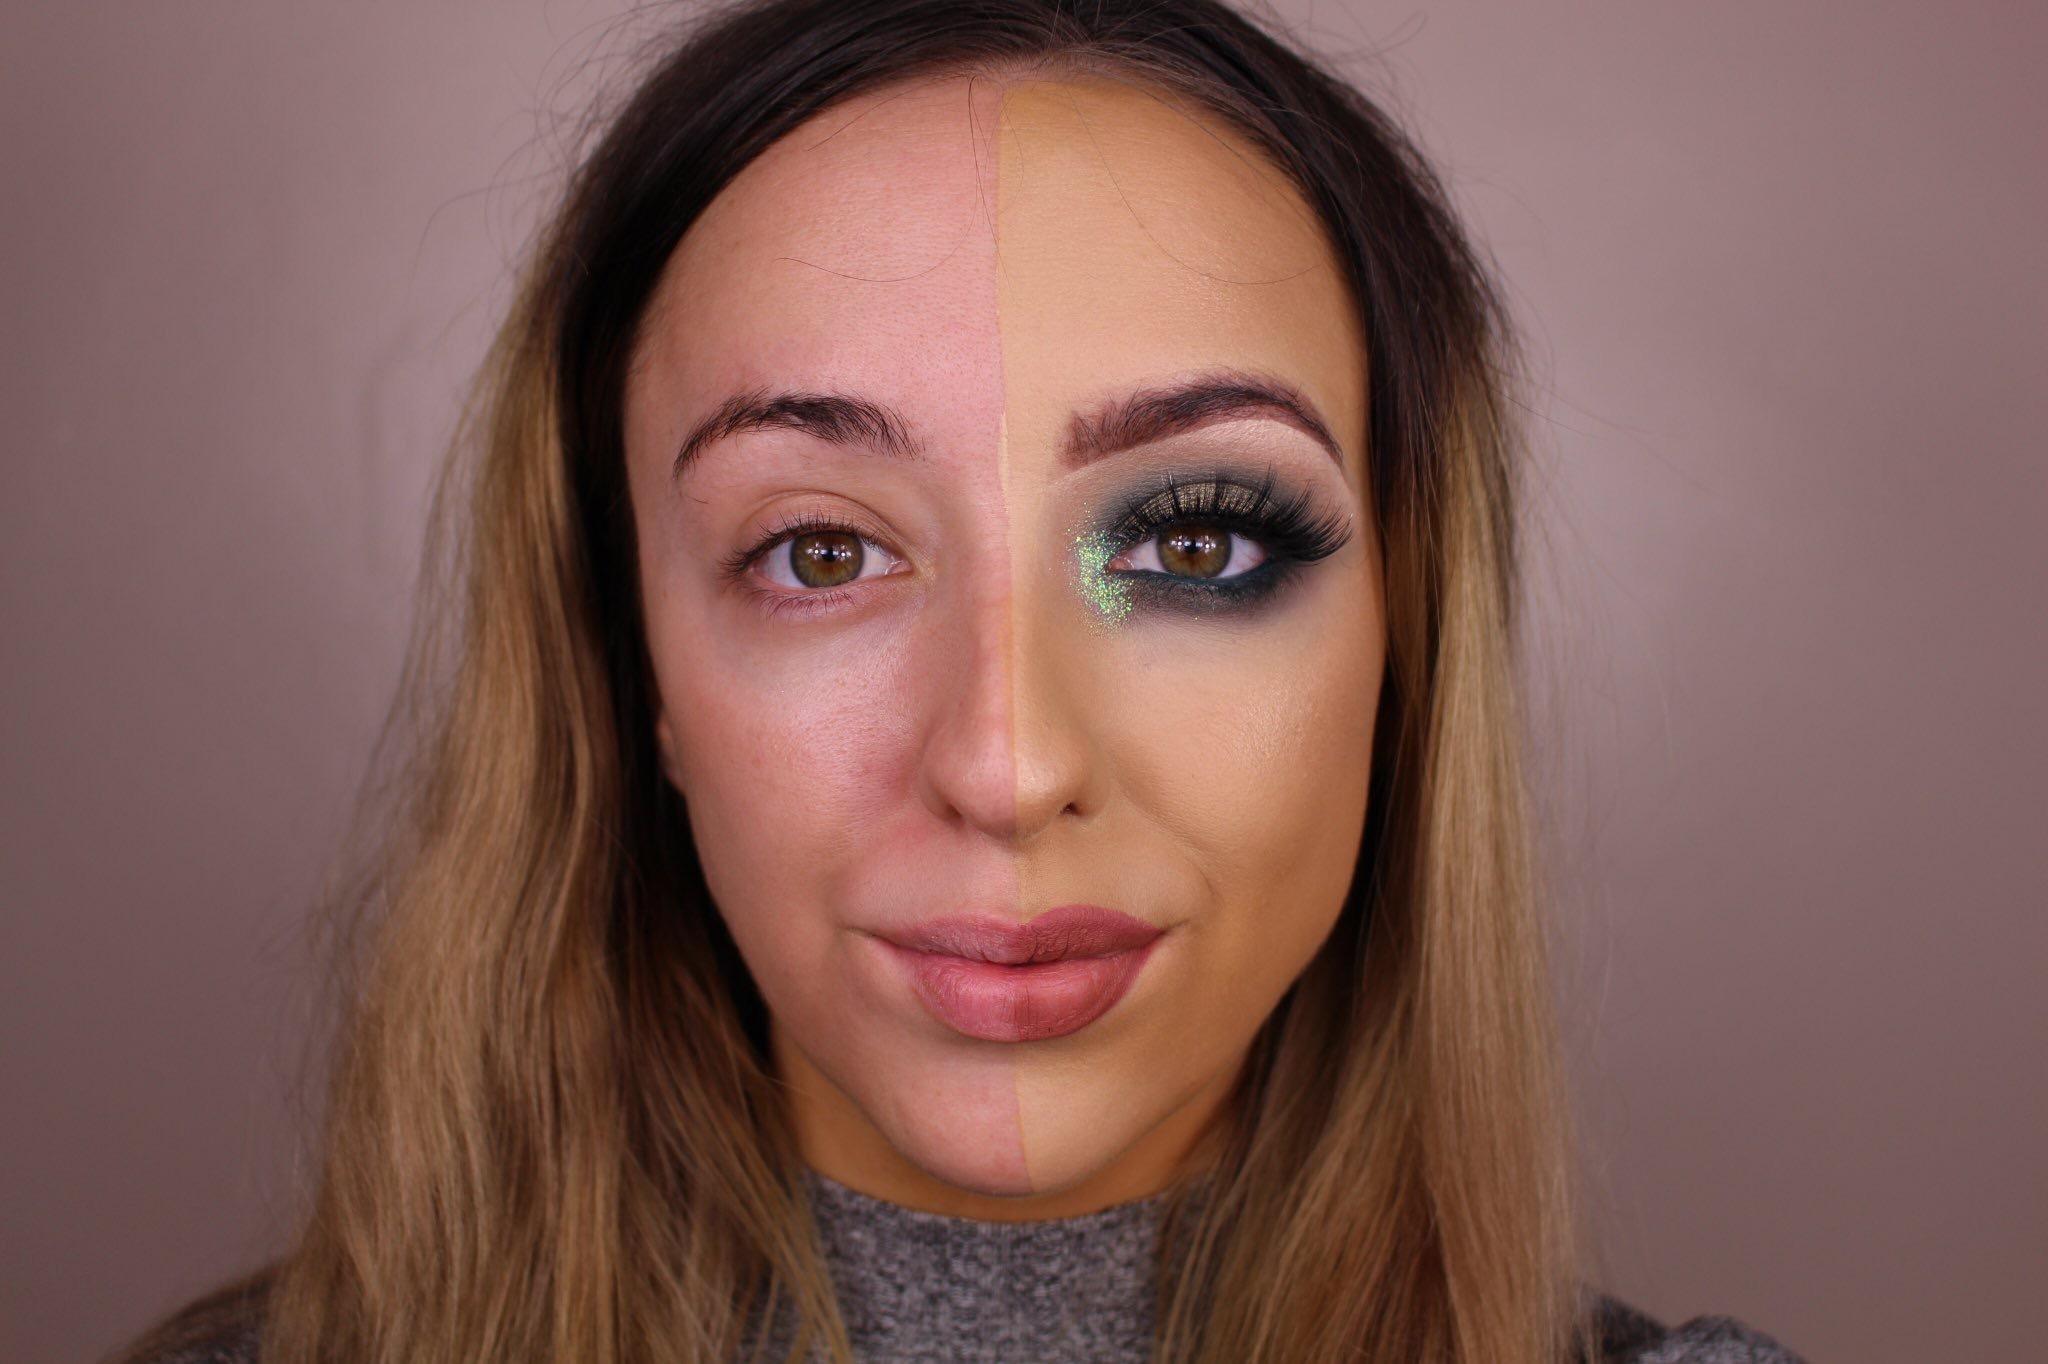 makeup transformations | split face